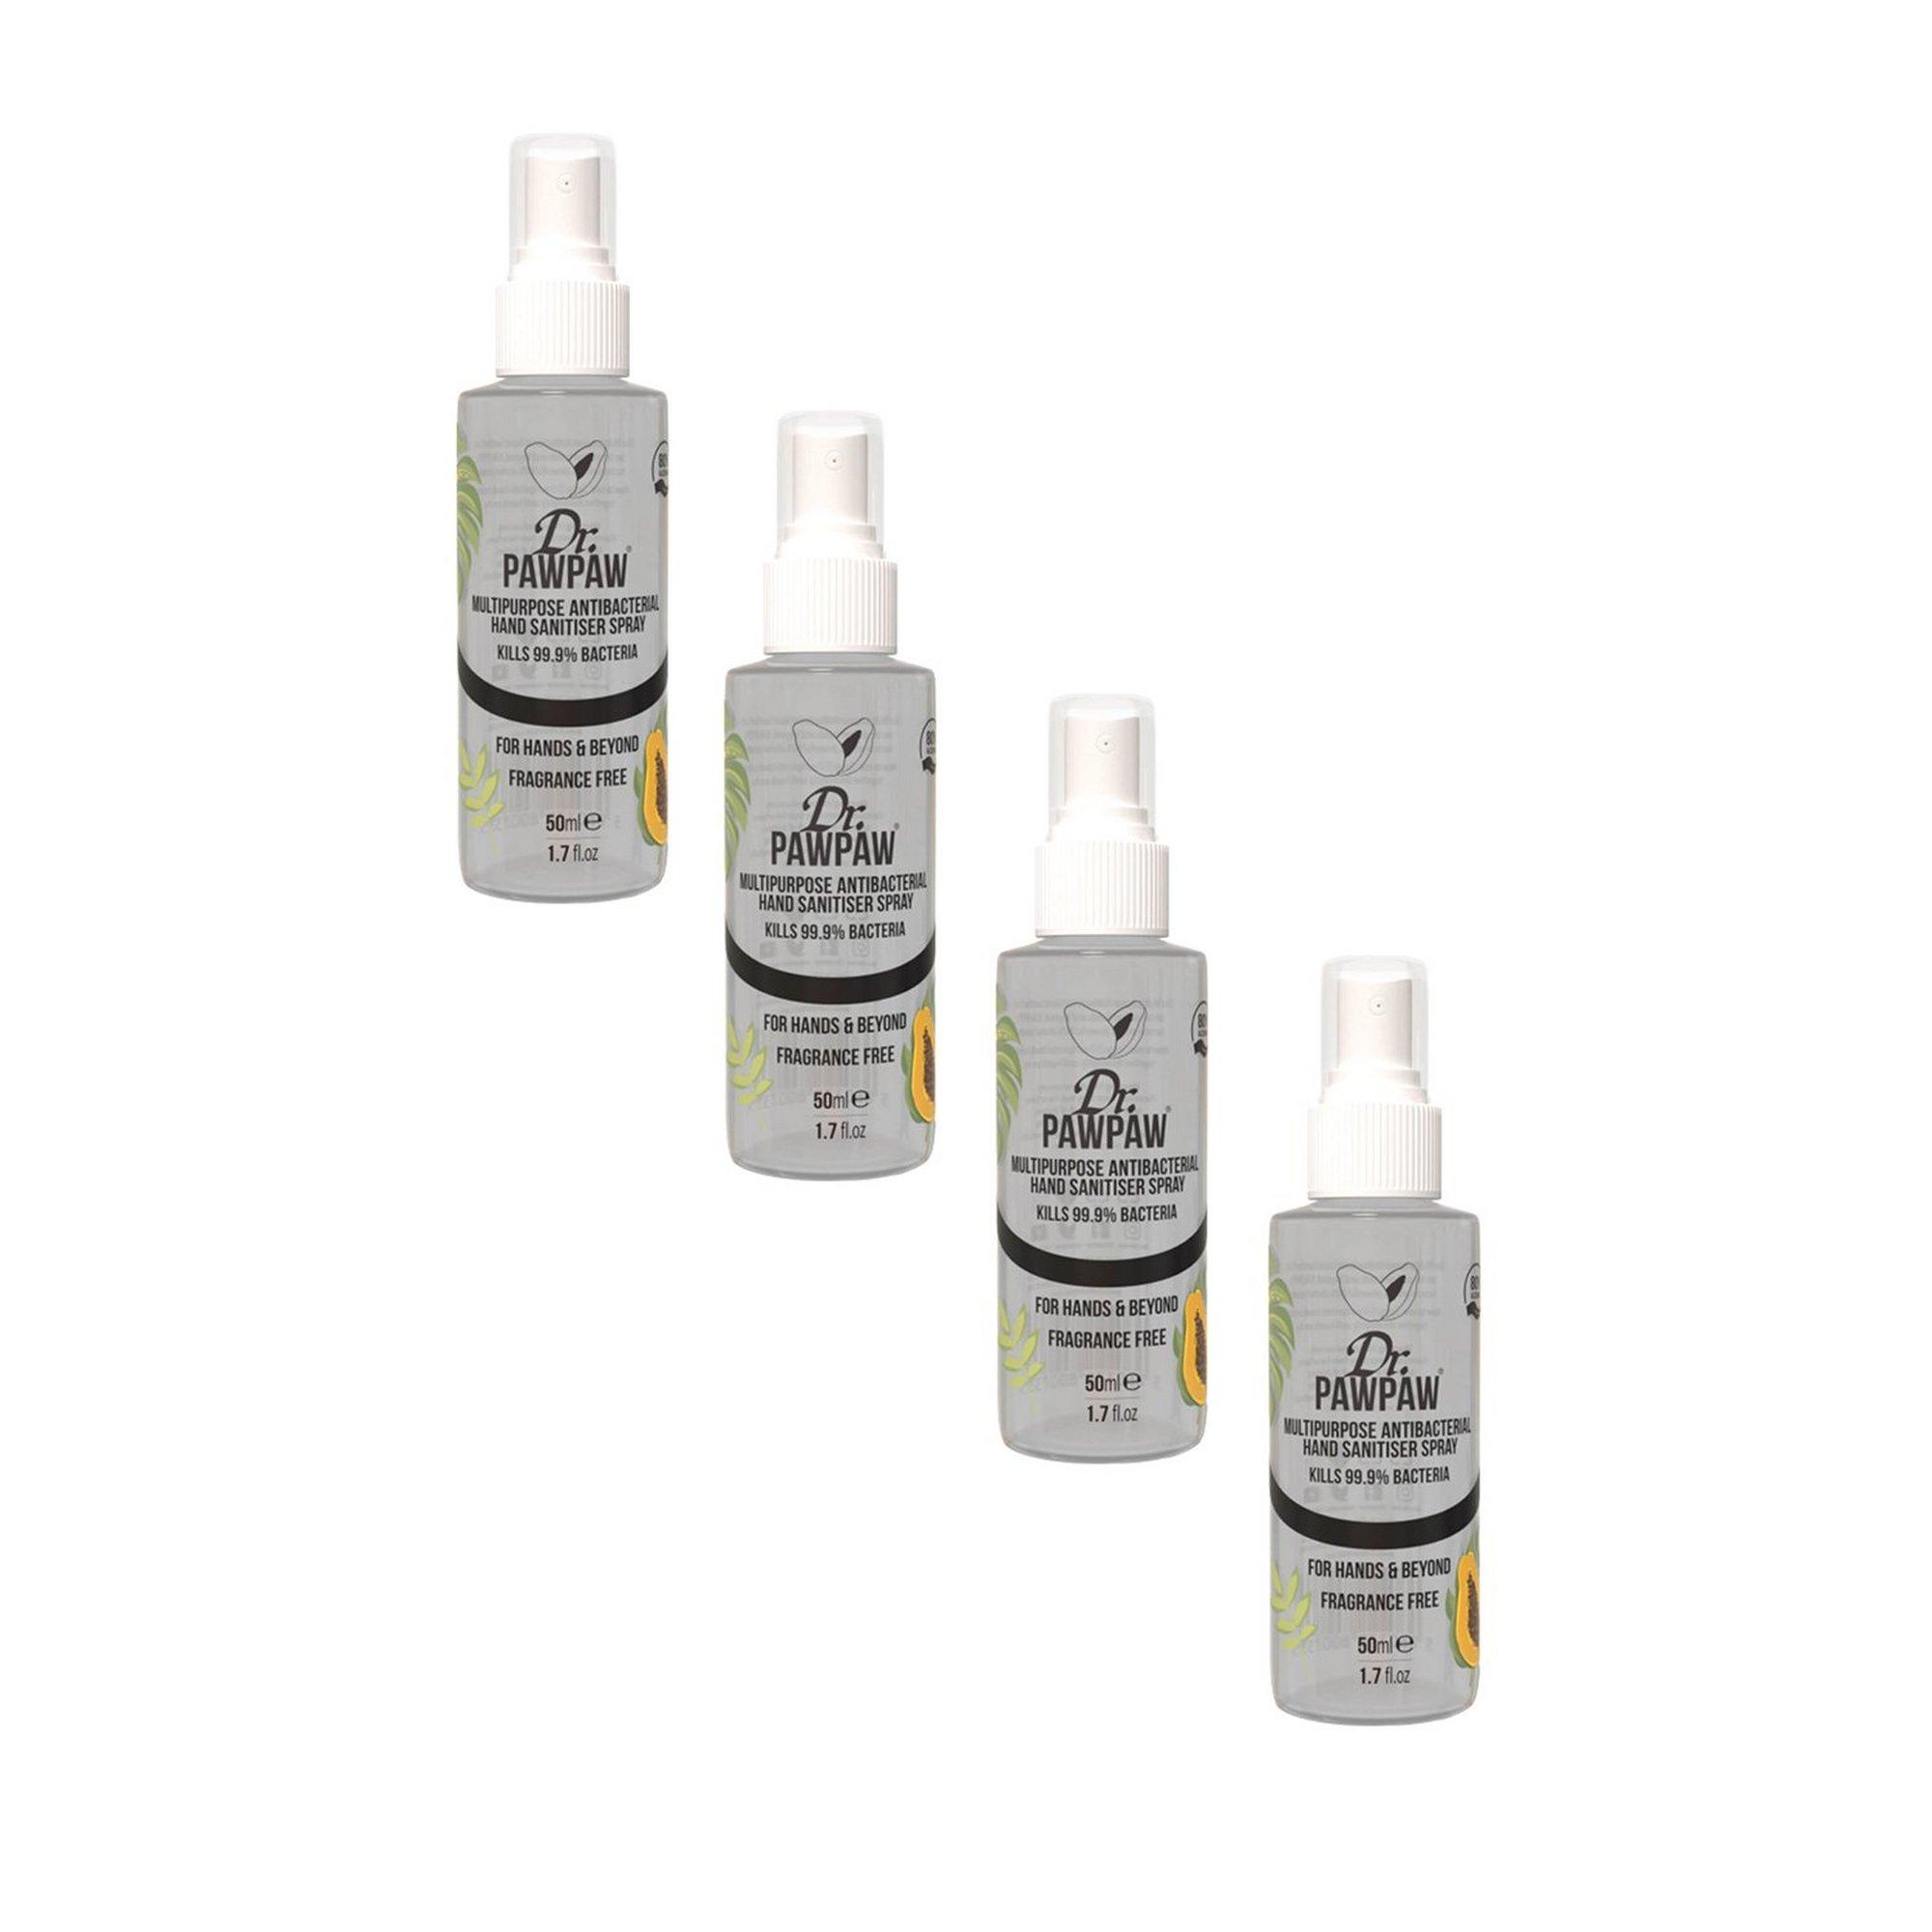 Image of Pack of 4 Dr Paw Paw Antibacterial Sanitiser Spray